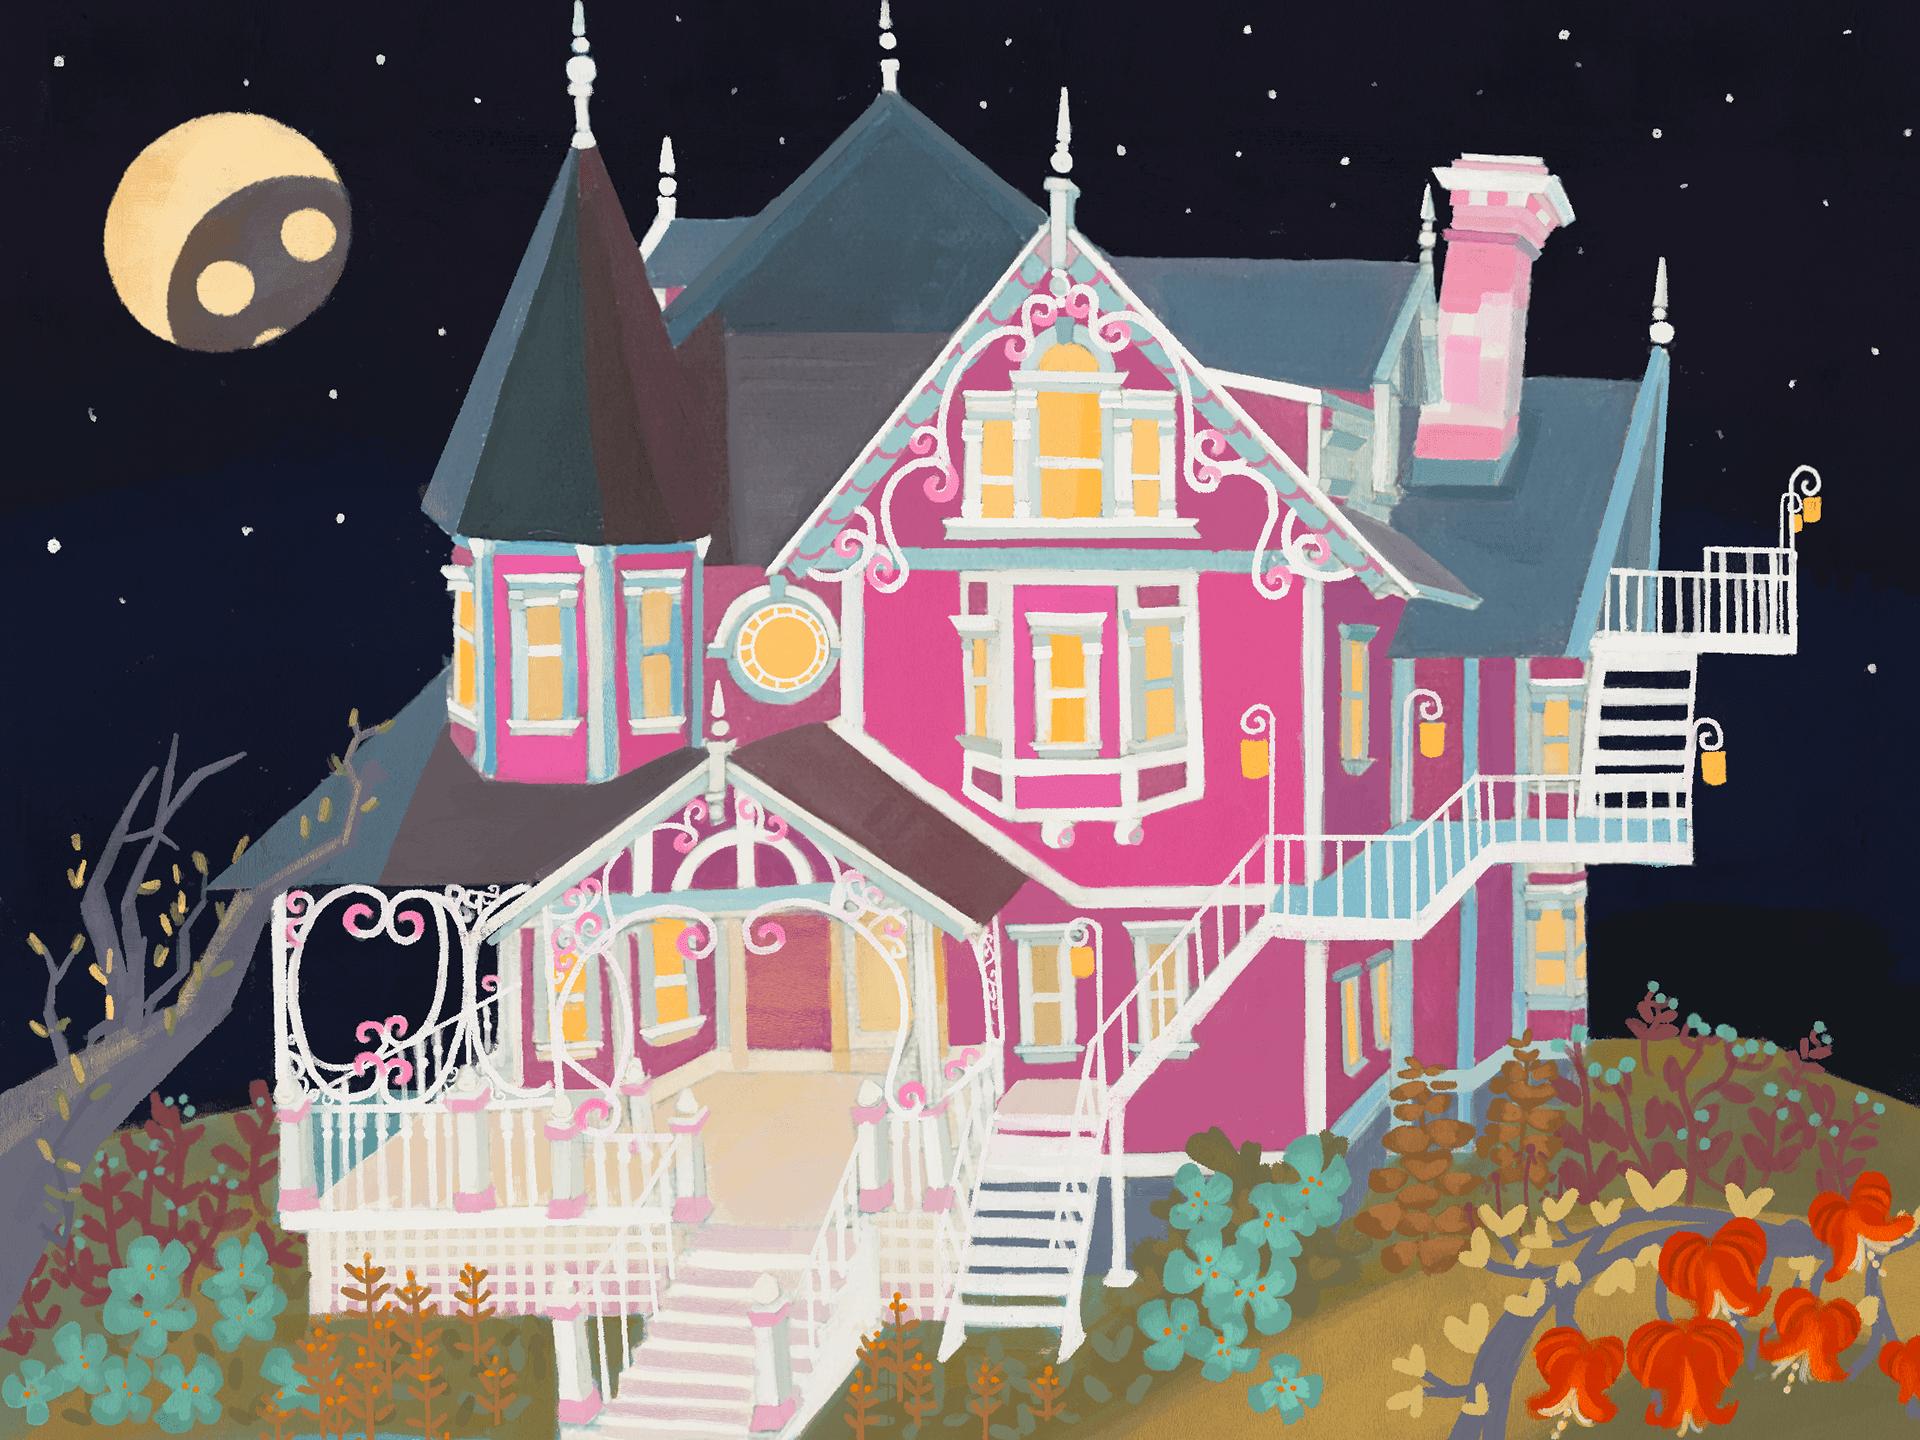 Coraline S House On Behance